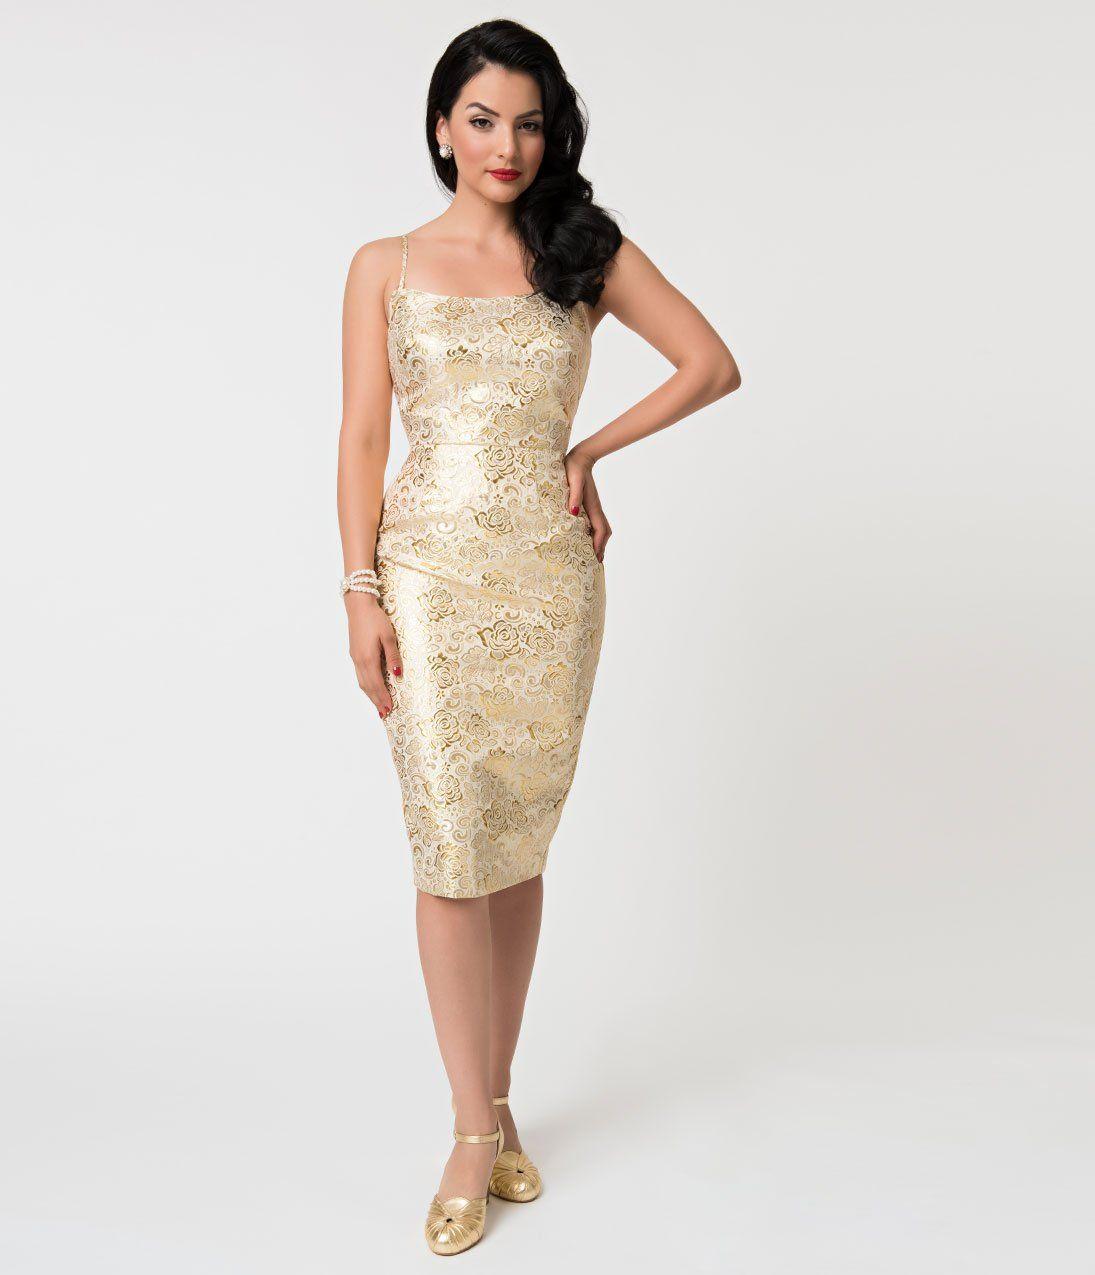 5158ca42cf0 Barbie x Unique Vintage Golden Girl Brocade Sheath Dress in 2019 ...